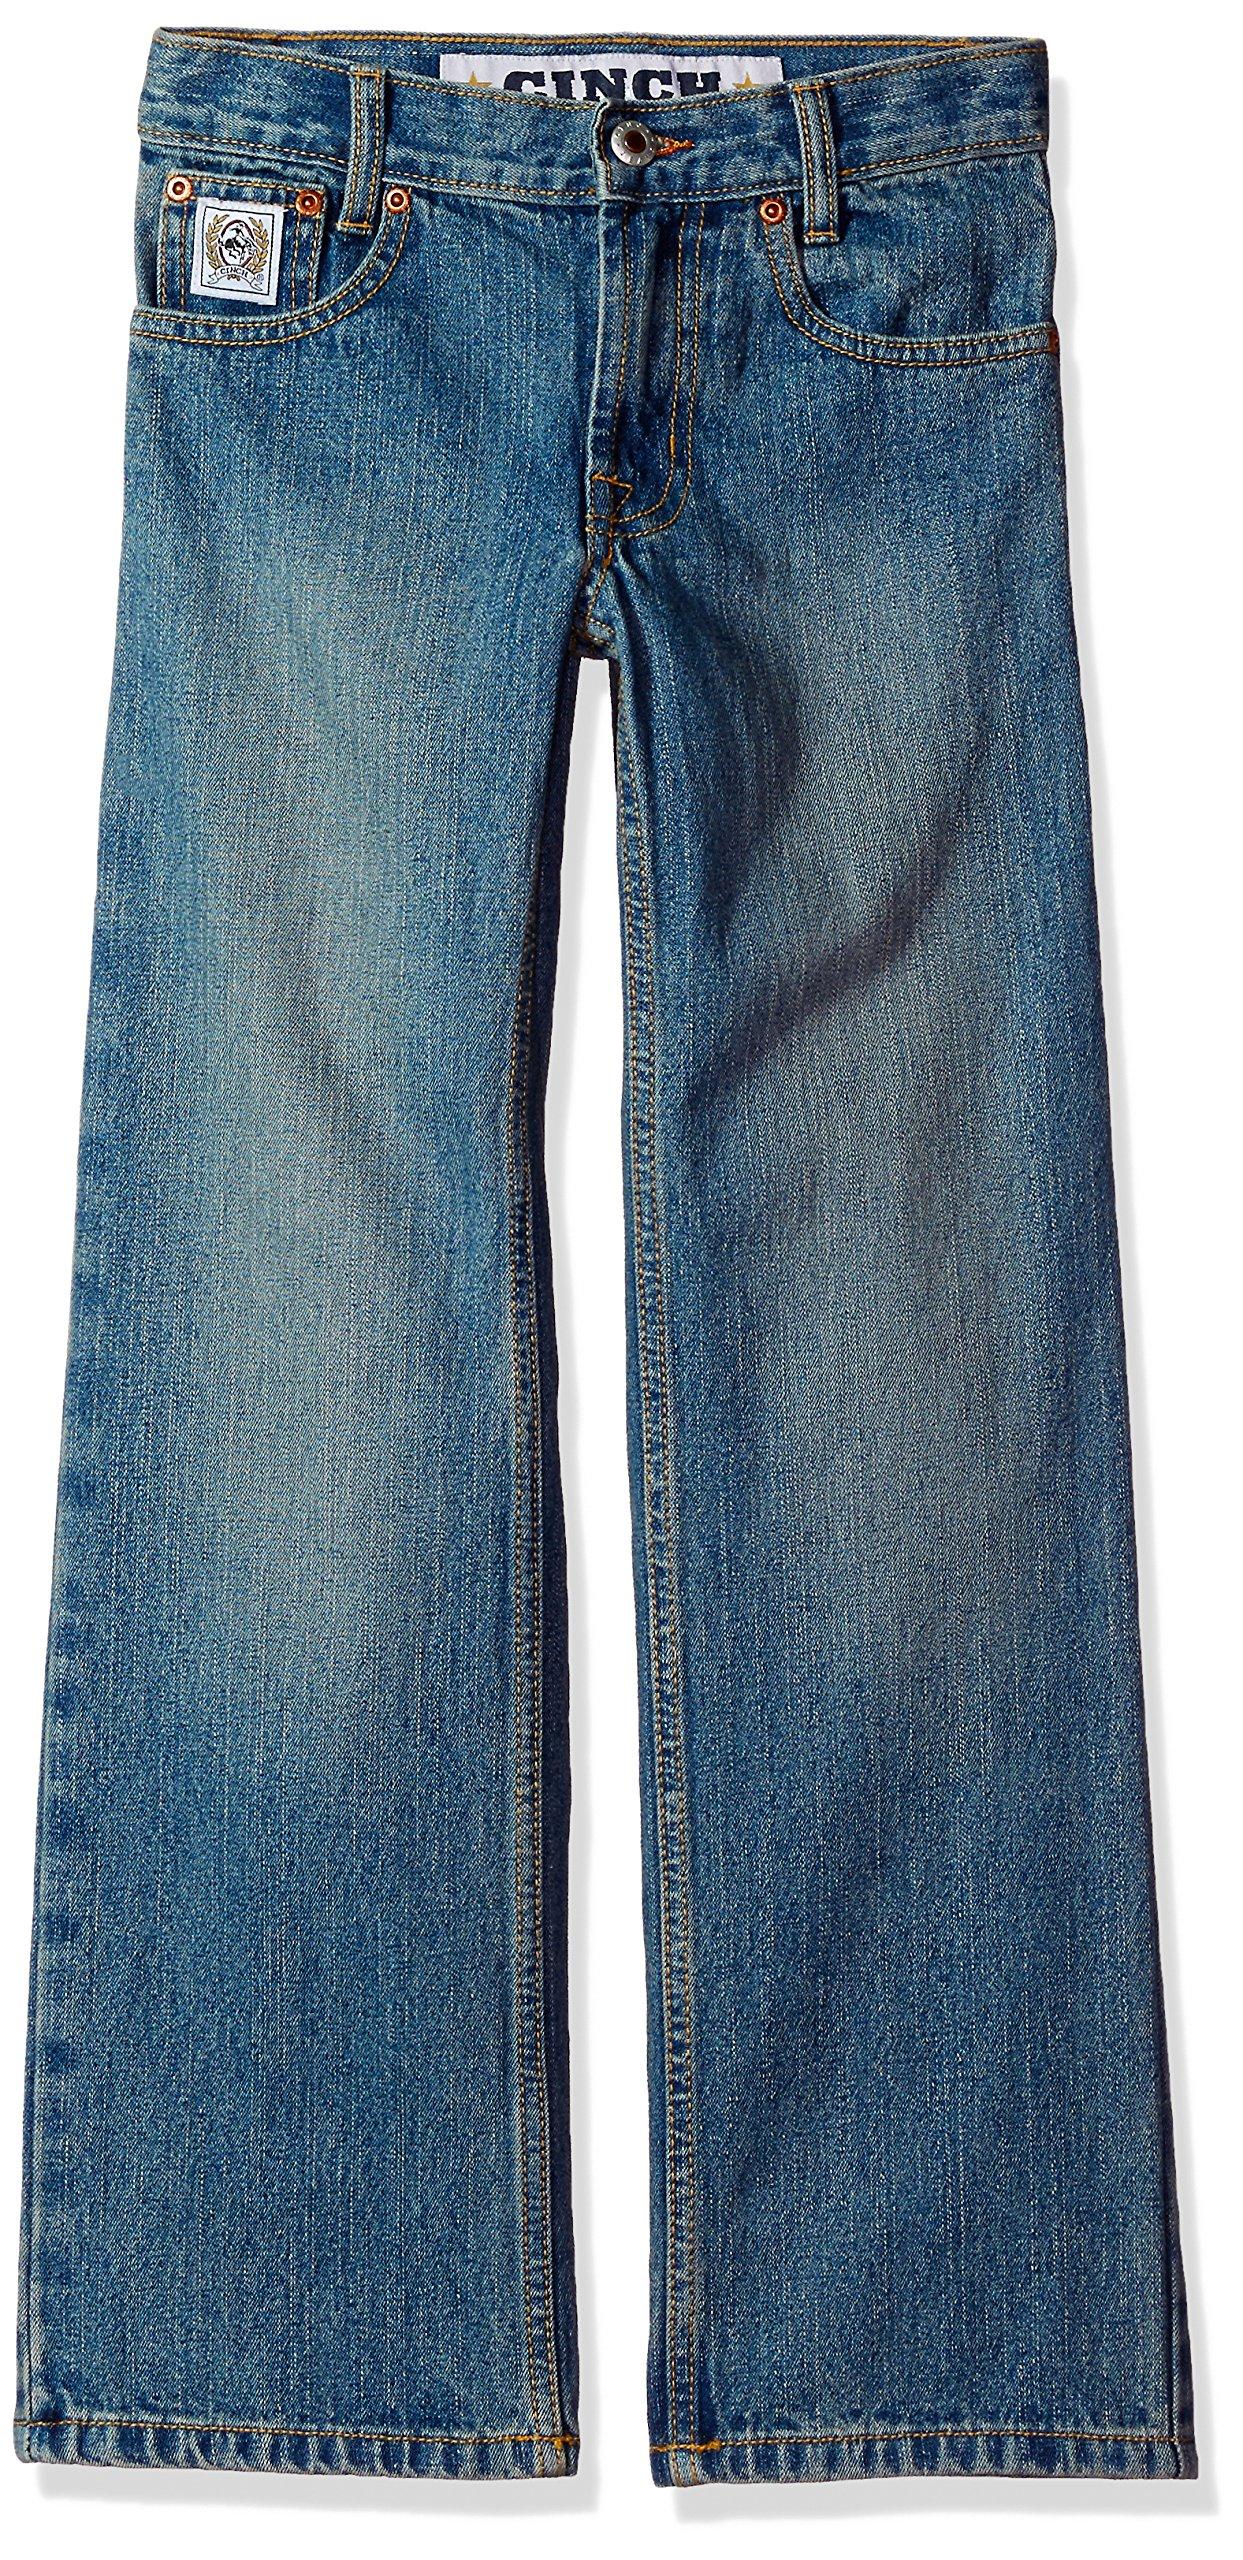 Cinch Boys' Big White Label Slim Jeans, Light Stone wash, 8S